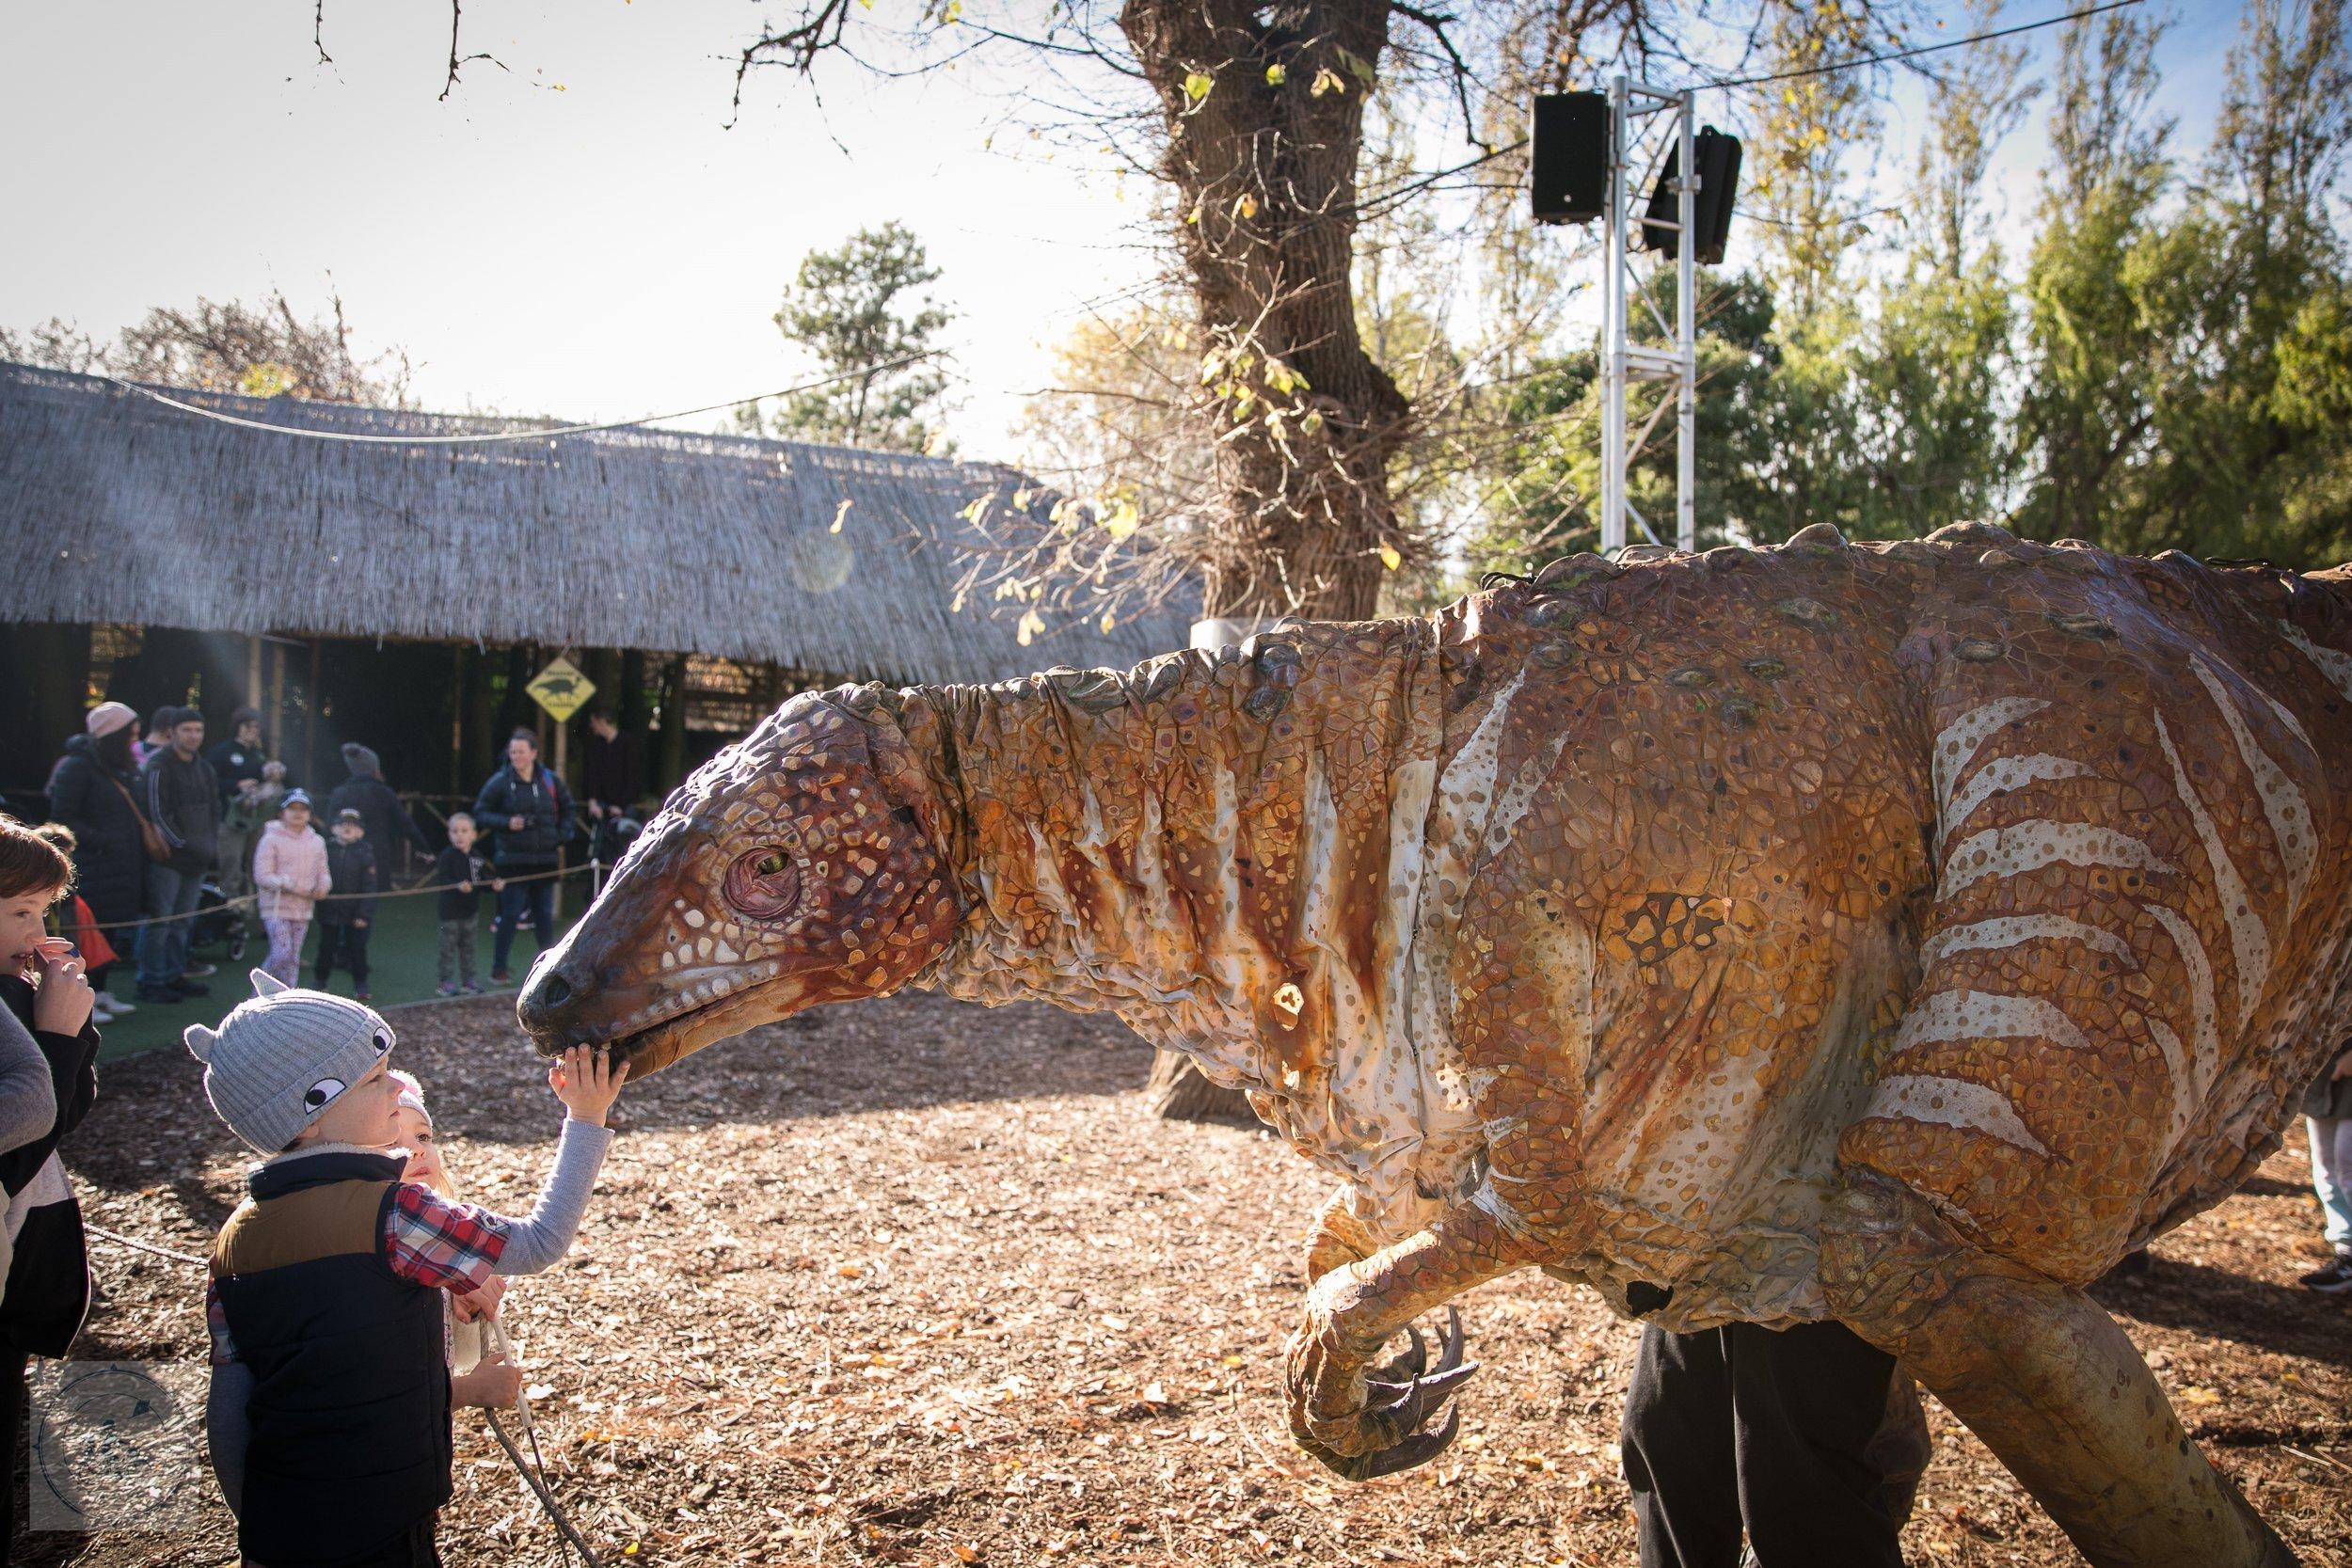 Dino Park Melbourne Zoo Mamma Knows Melbourne (50 of 62).jpg